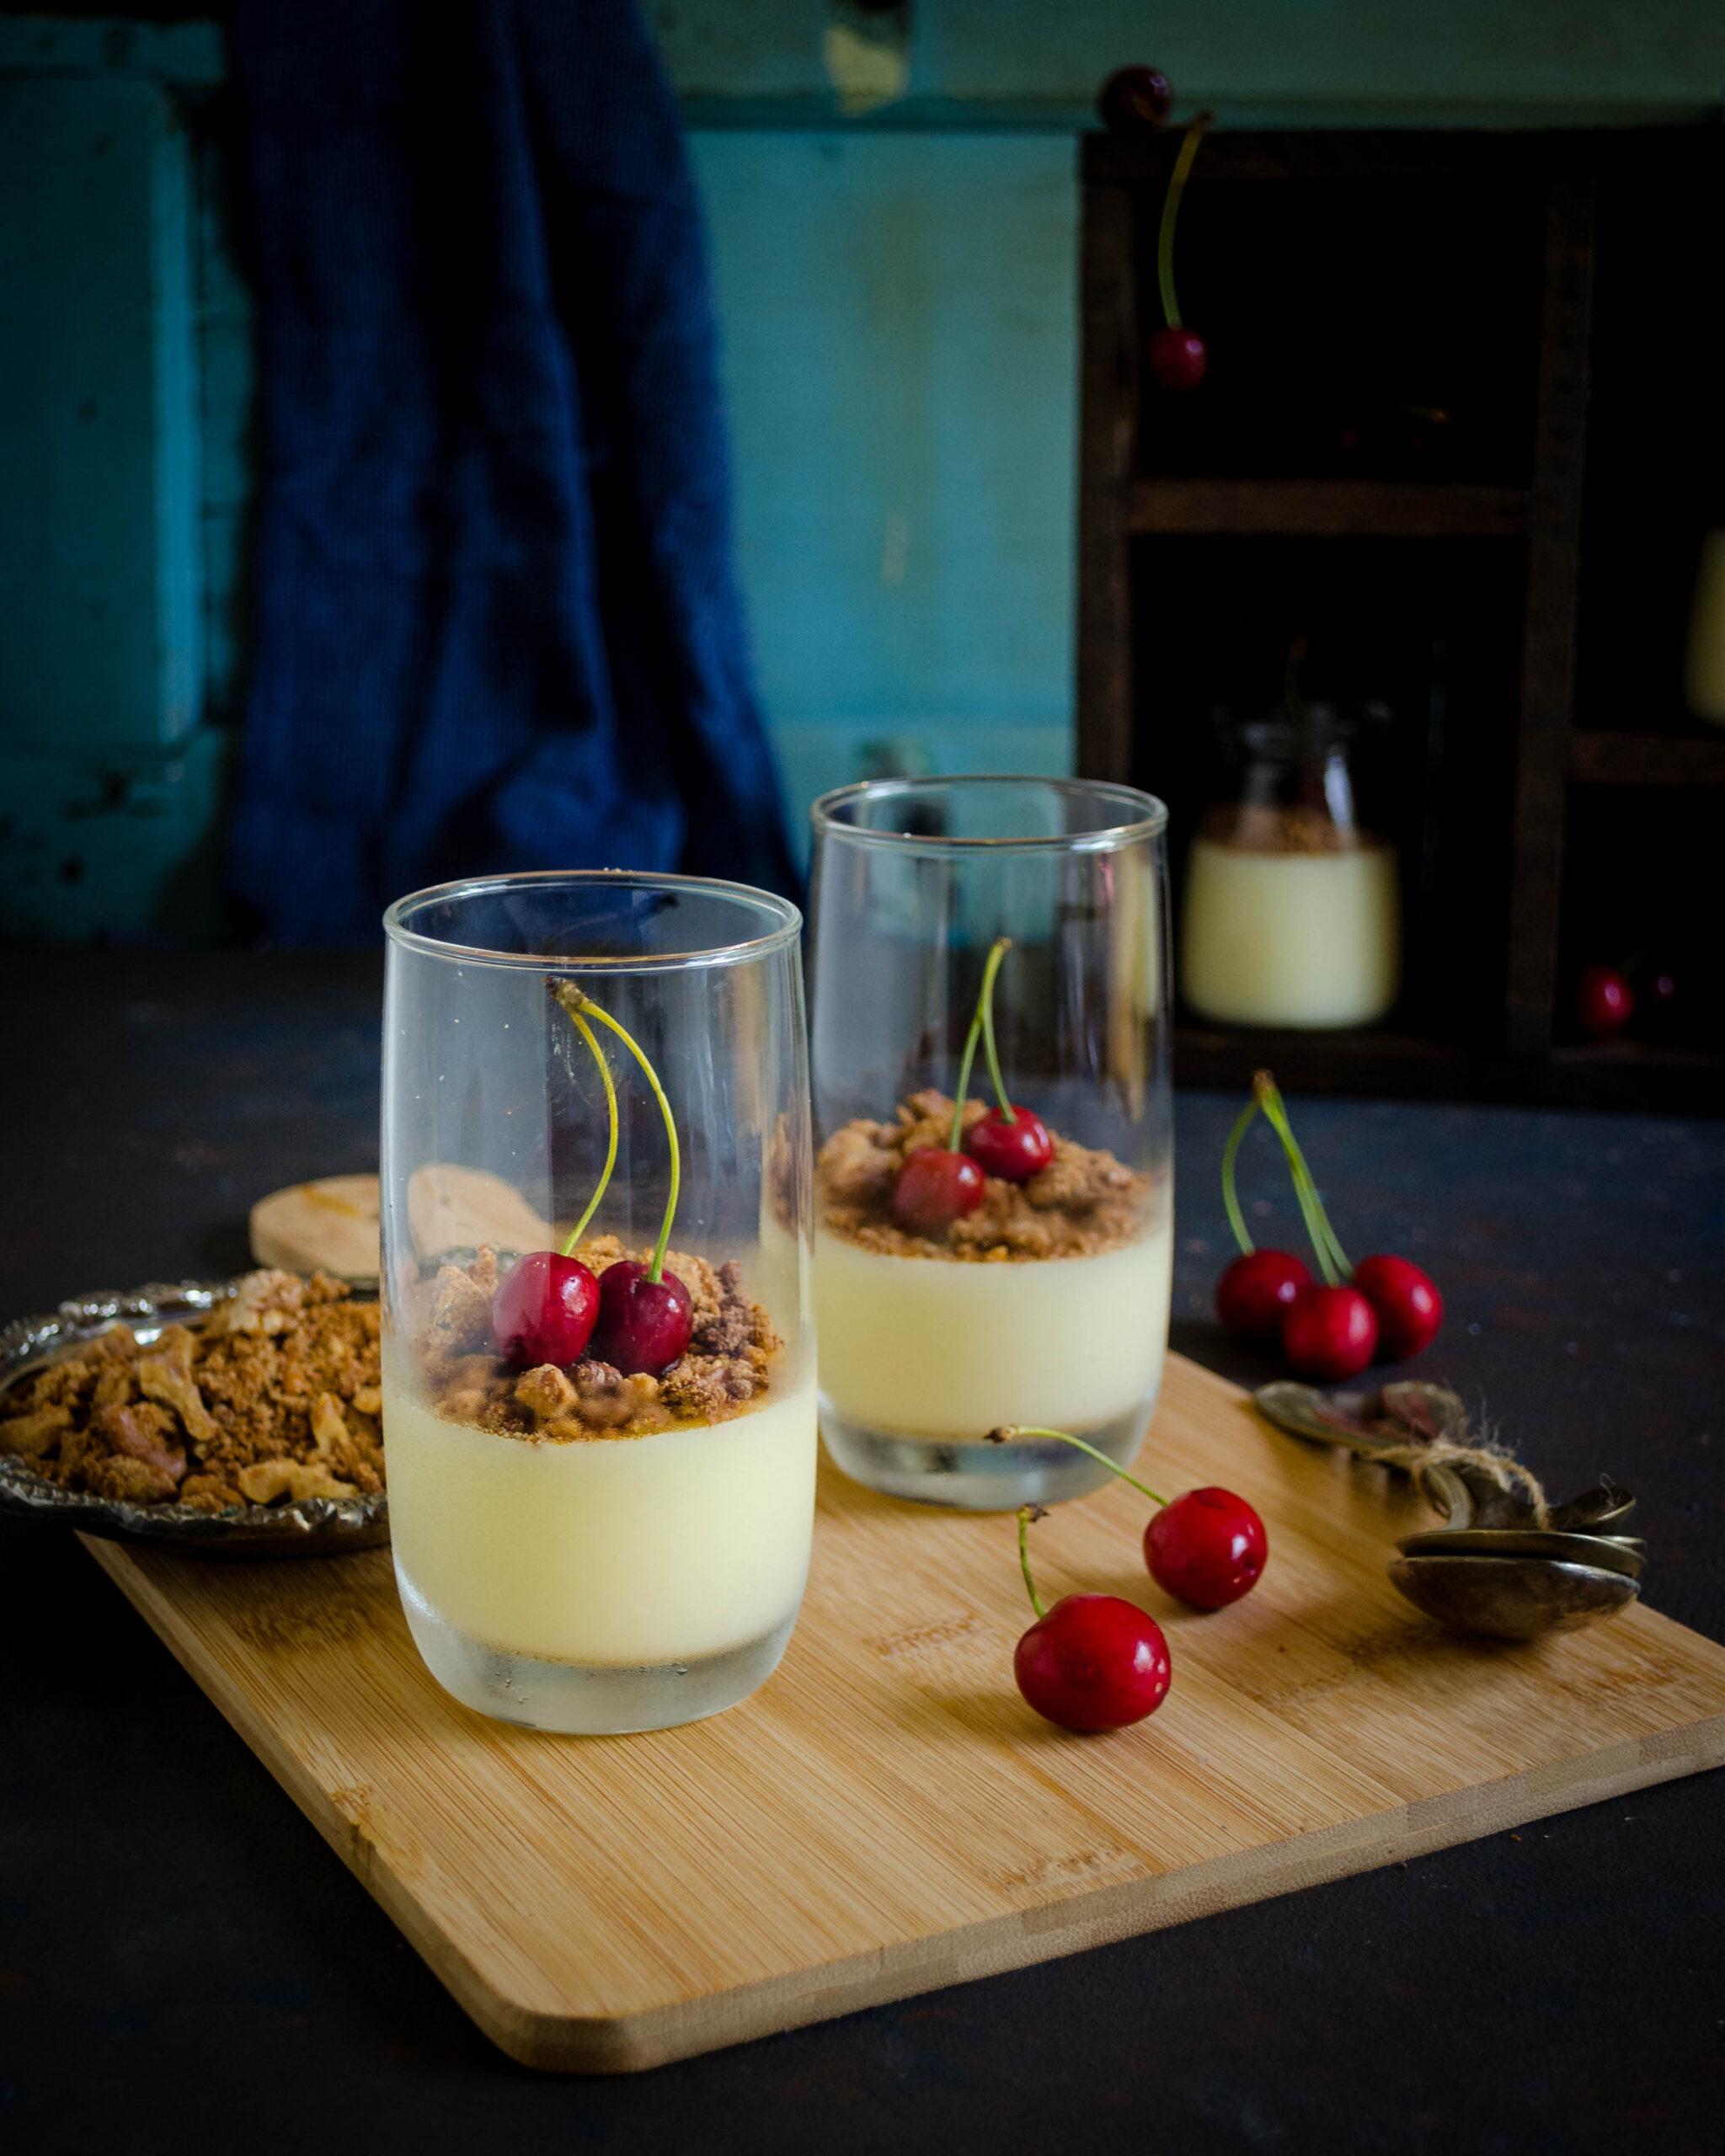 walnut crumble recipe